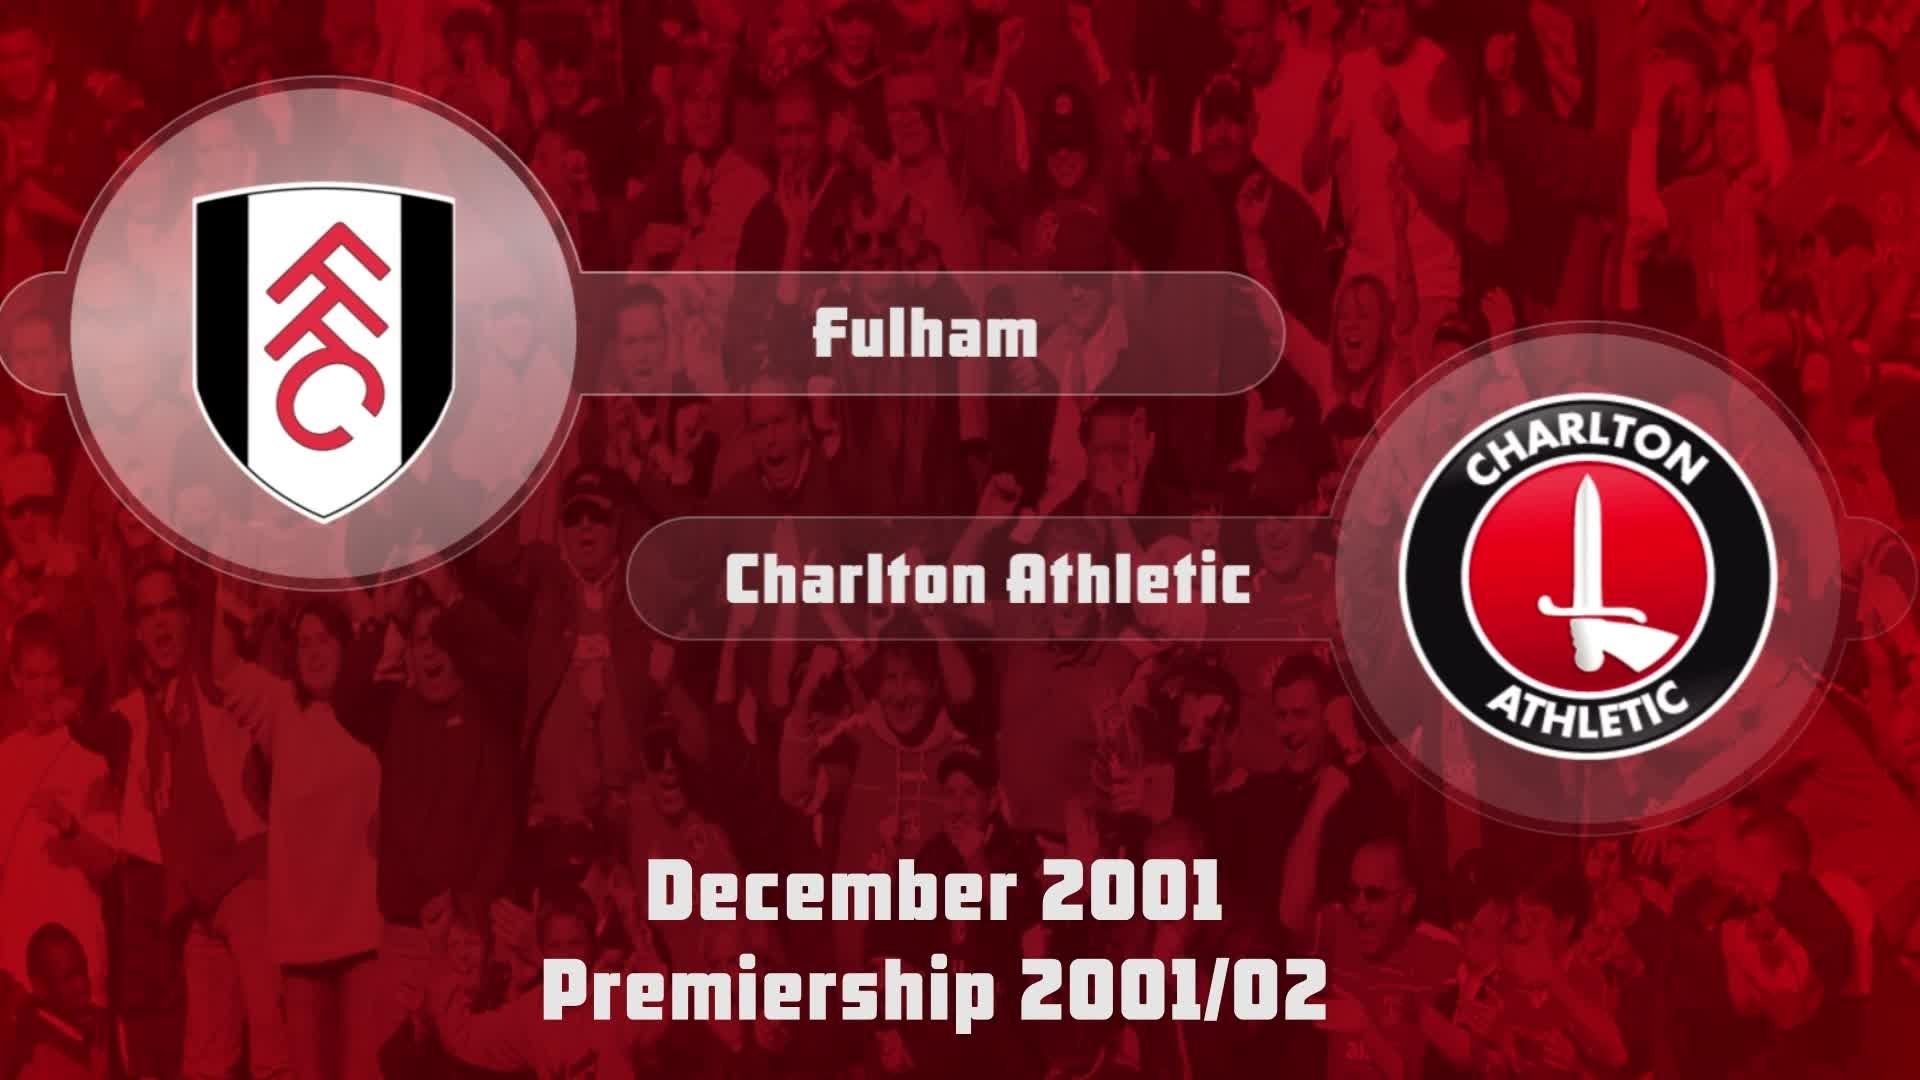 22 HIGHLIGHTS | Fulham 0 Charlton 0 (Dec 2001)